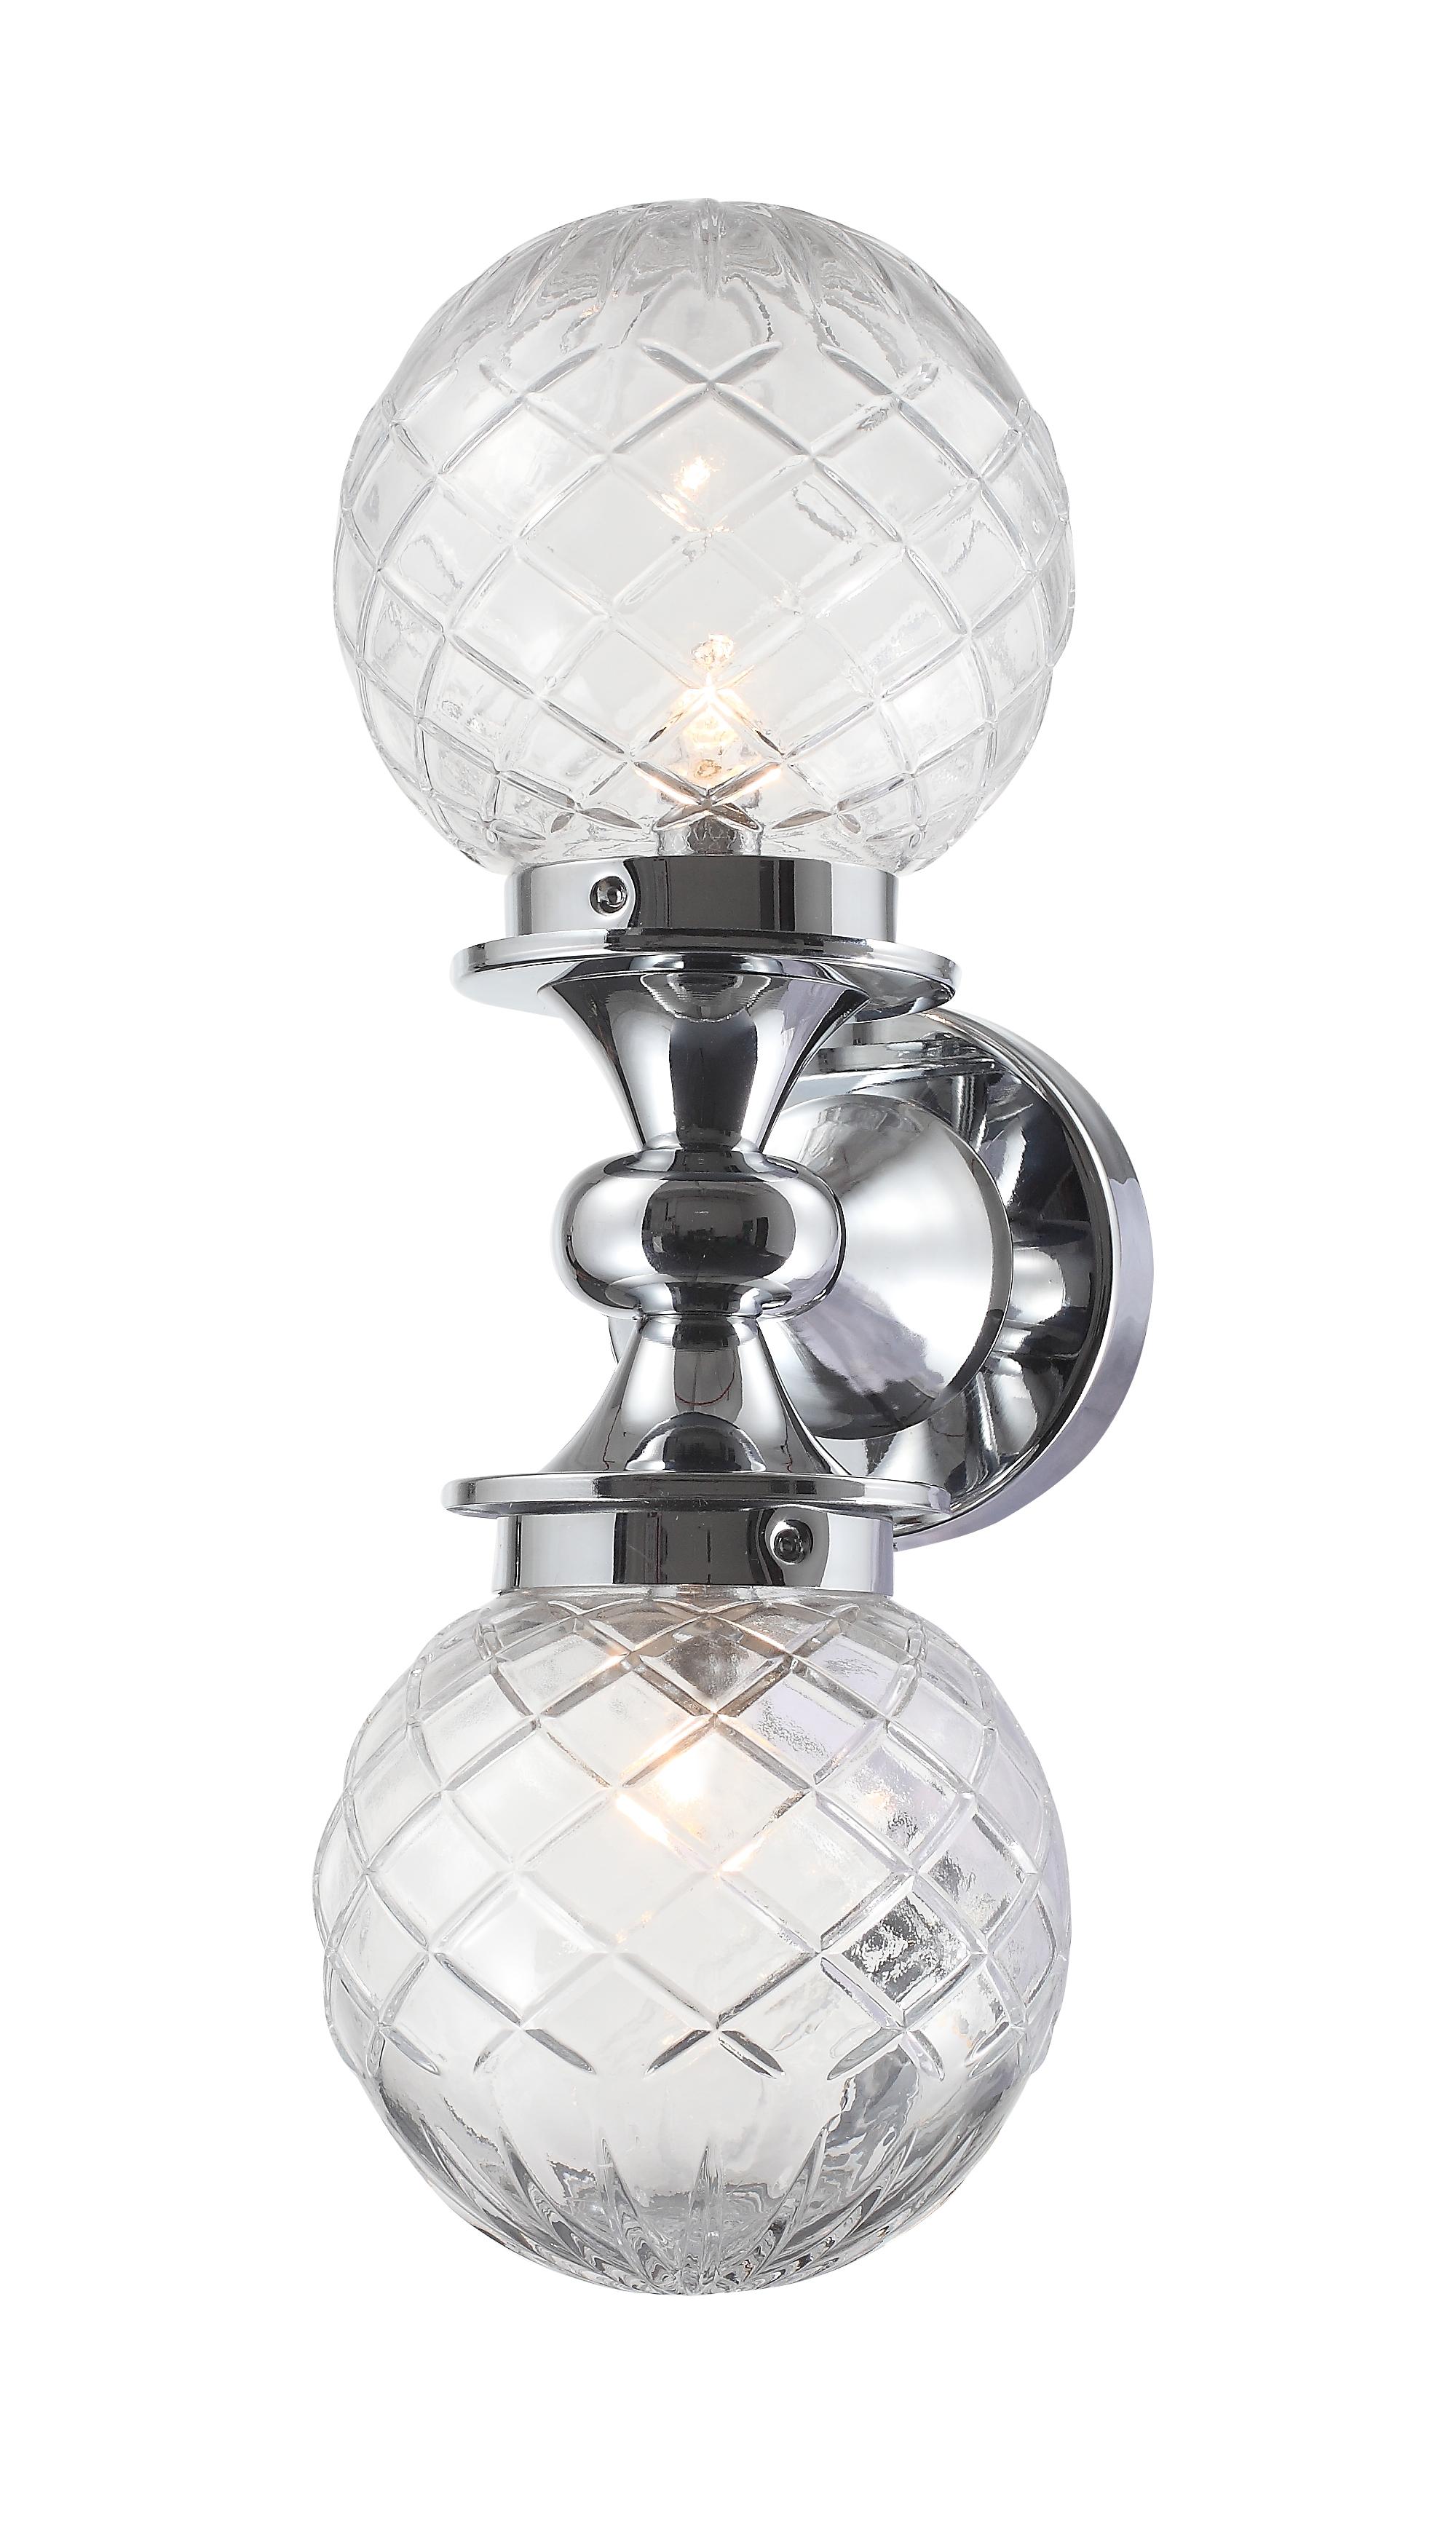 Bathroom Lights Essex crystorama 202-ch essex 2 light bathroom-vanity light in polished